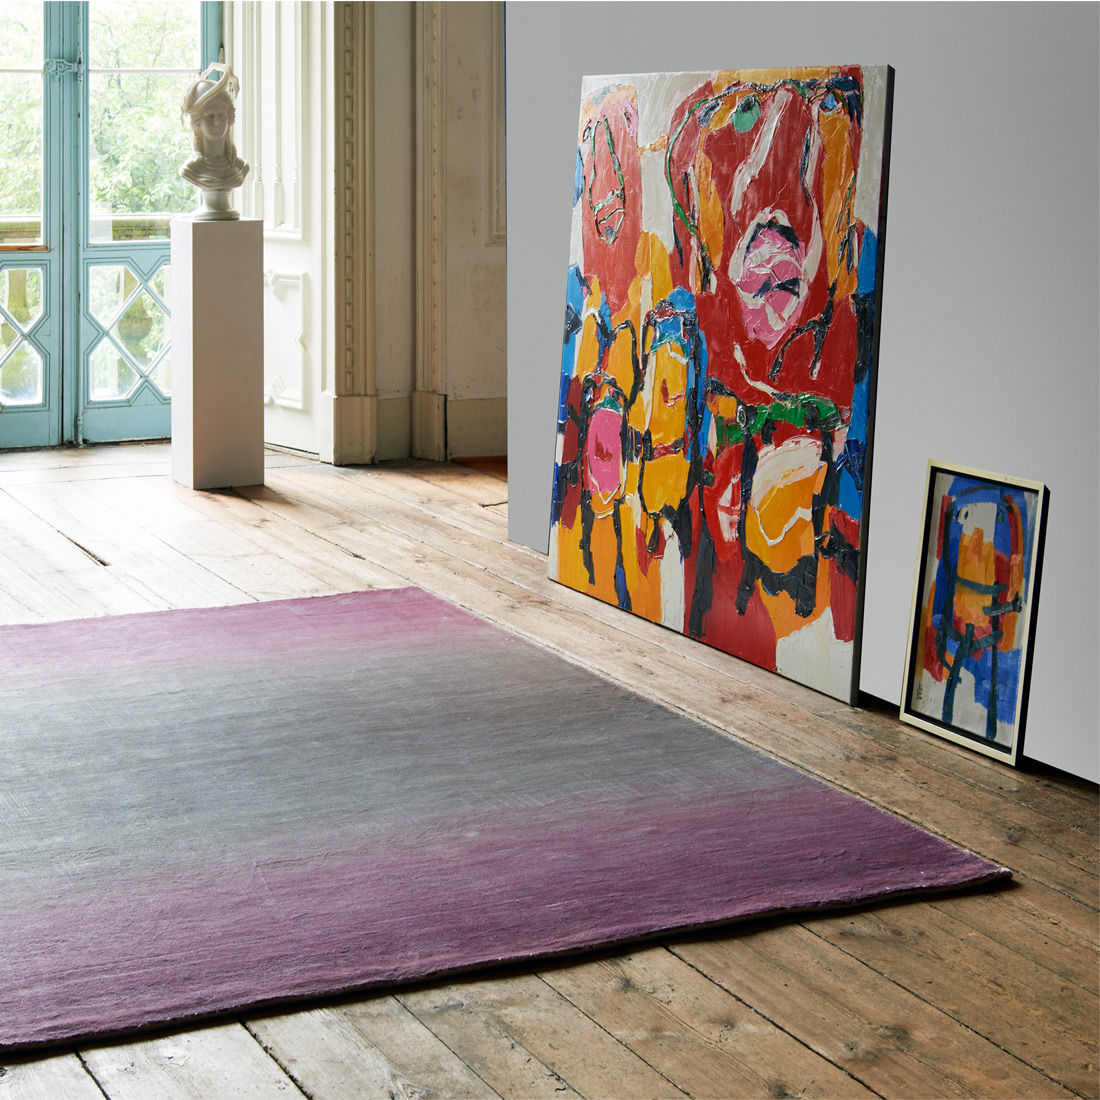 Vloerkleed Xilento Space Powder | 170 x 230 cm